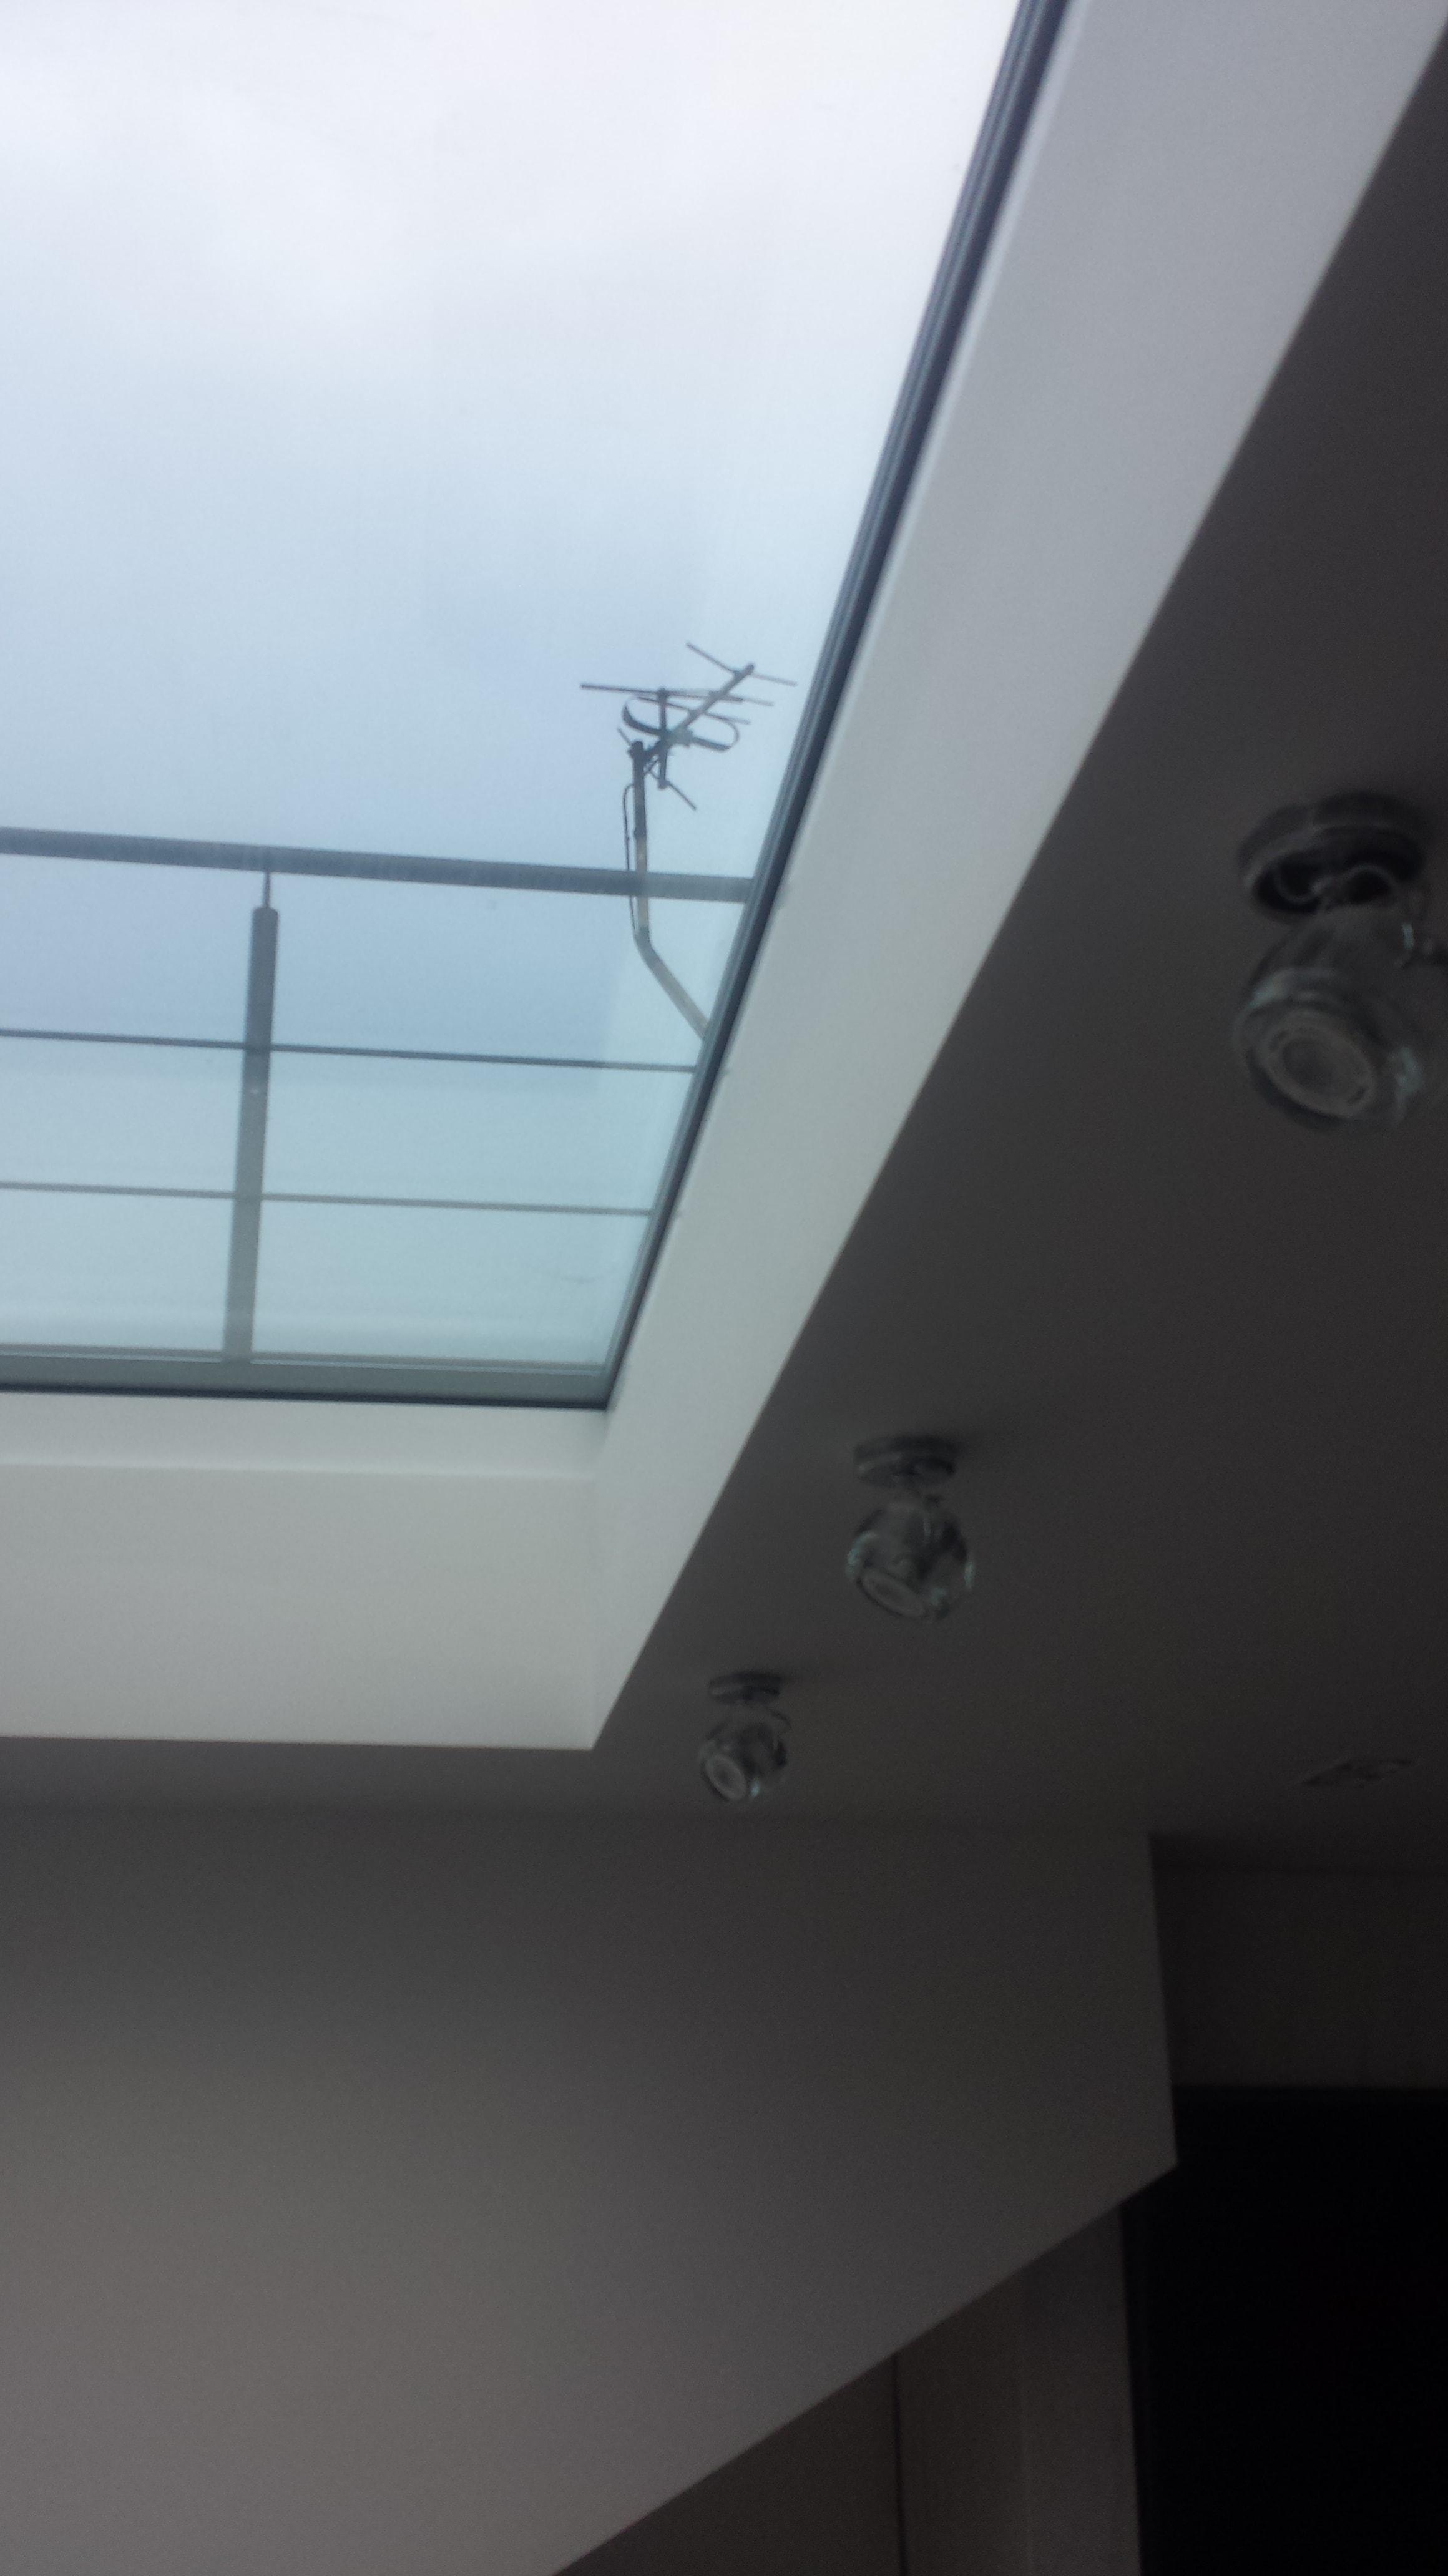 midos rooflights window